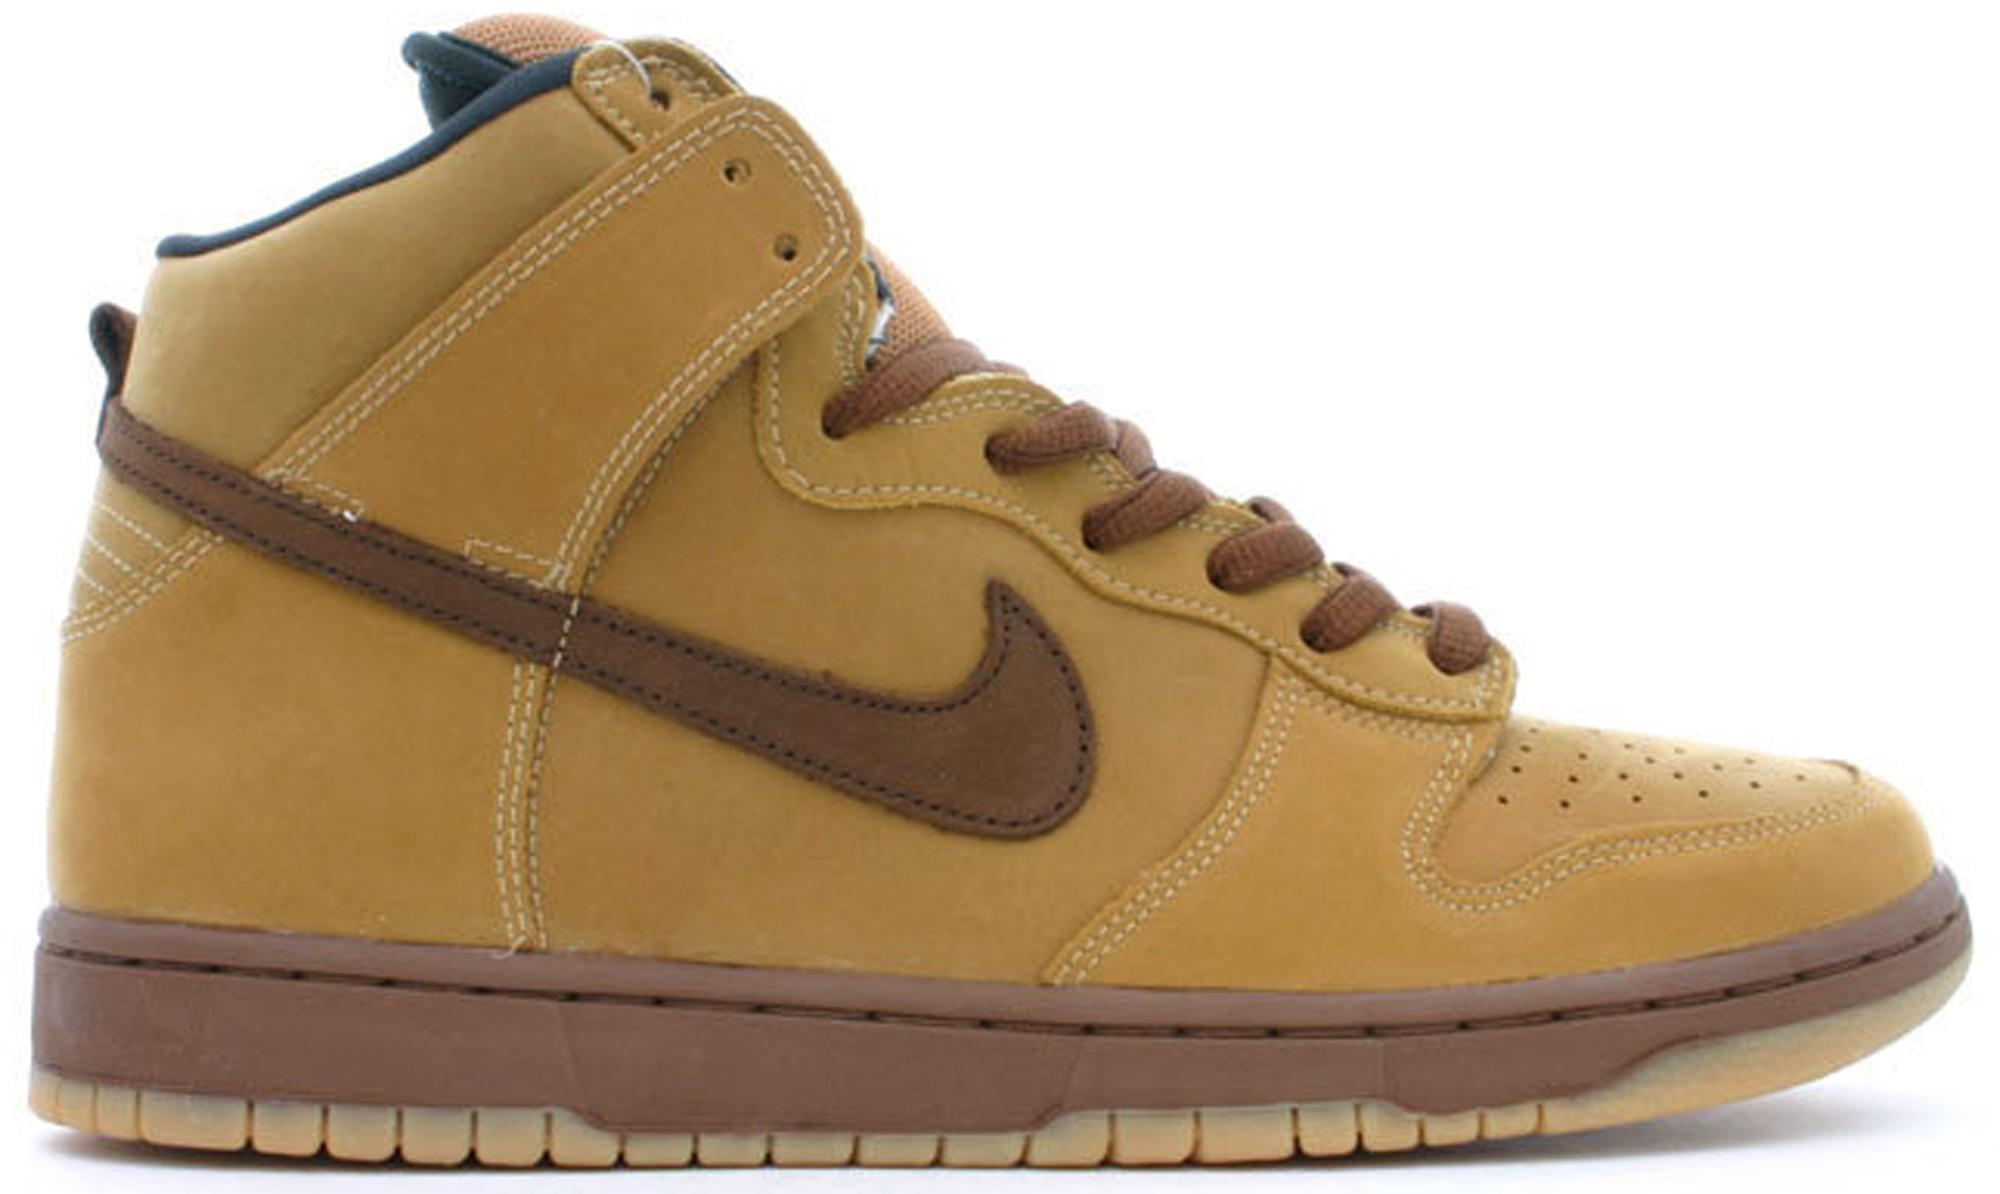 Nike Dunk SB High Wheat - 305050-221